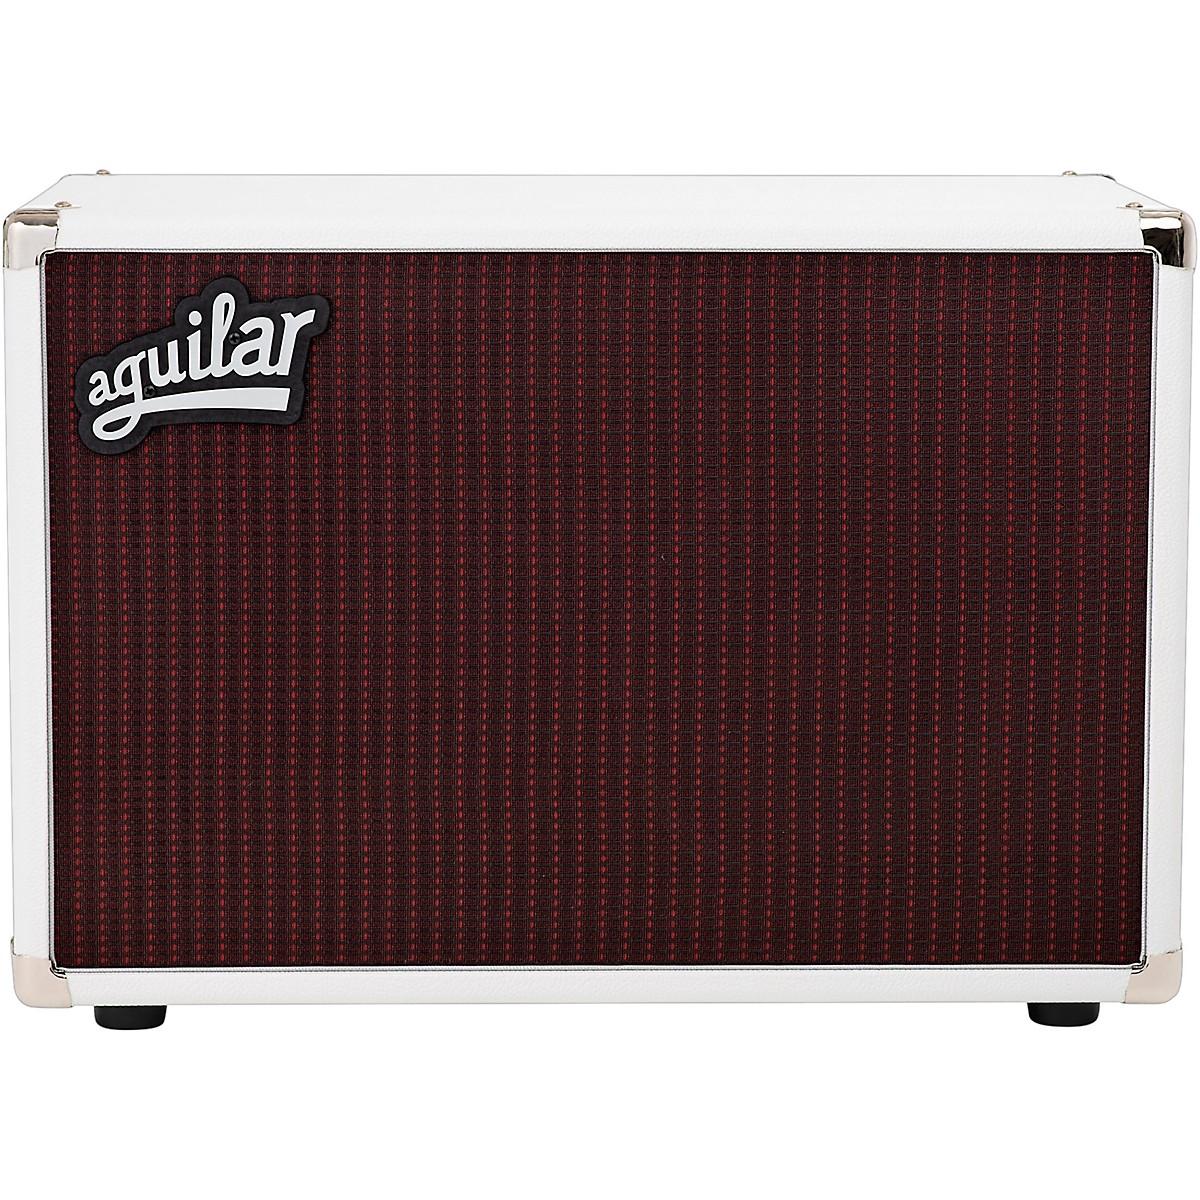 Aguilar DB 210 White Hot 350W 2x10 Bass Speaker Cabinet - 4 ohm